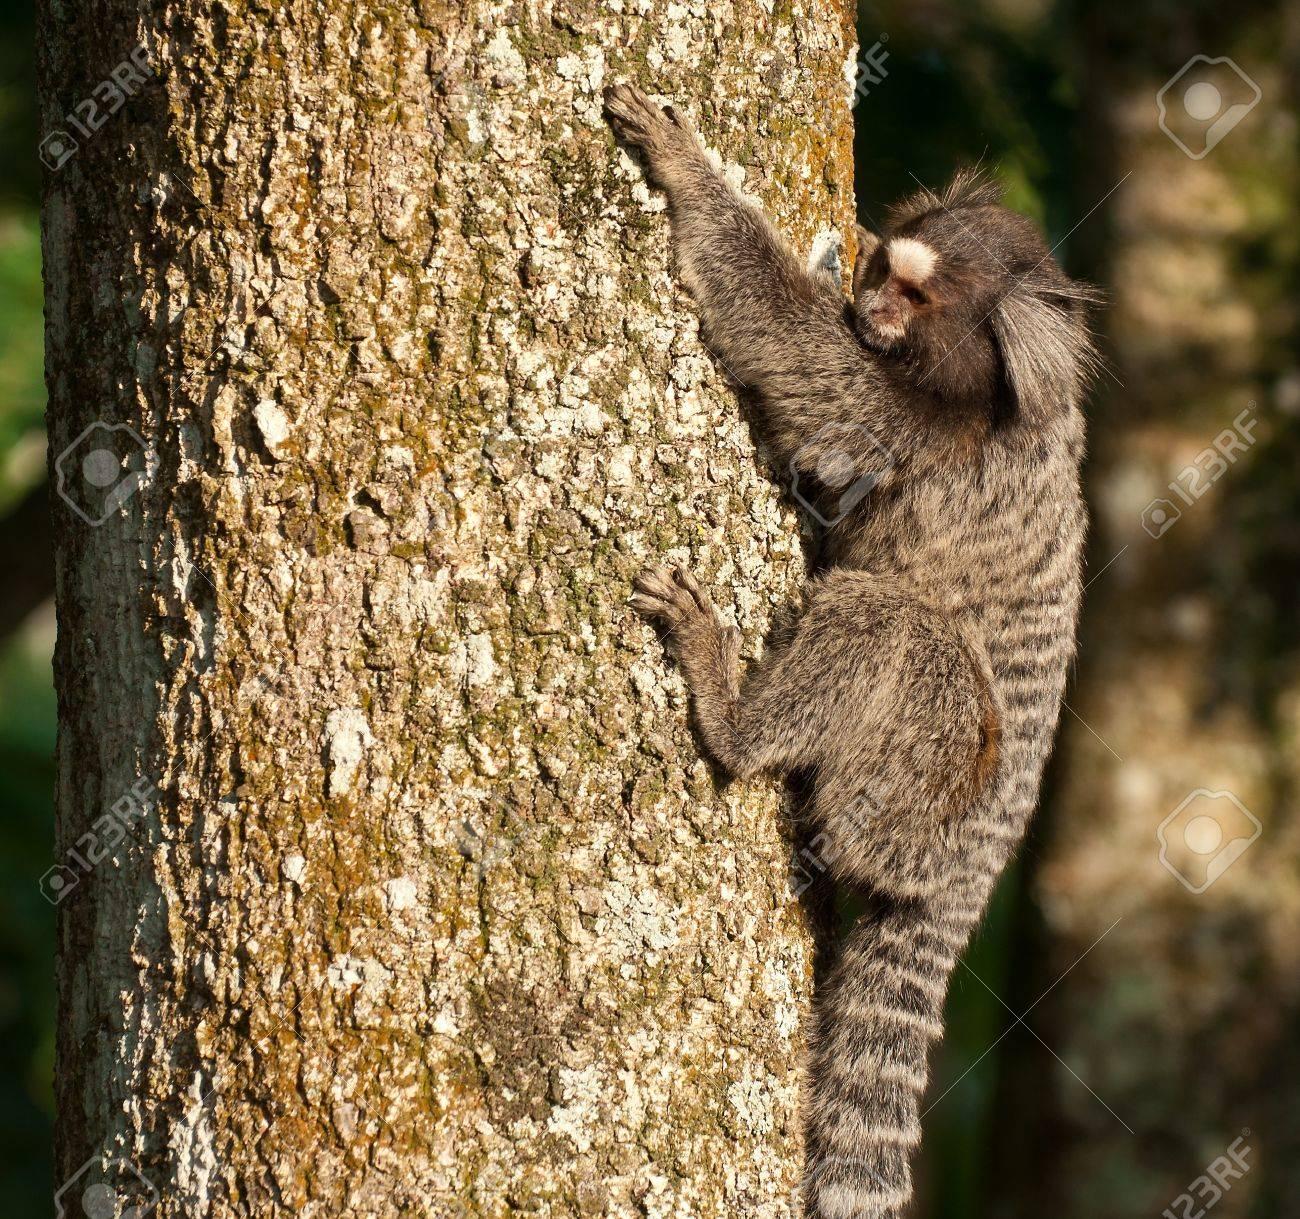 Monkey Marmoset in Rio de Janeiro  Brazil Stock Photo - 13620070